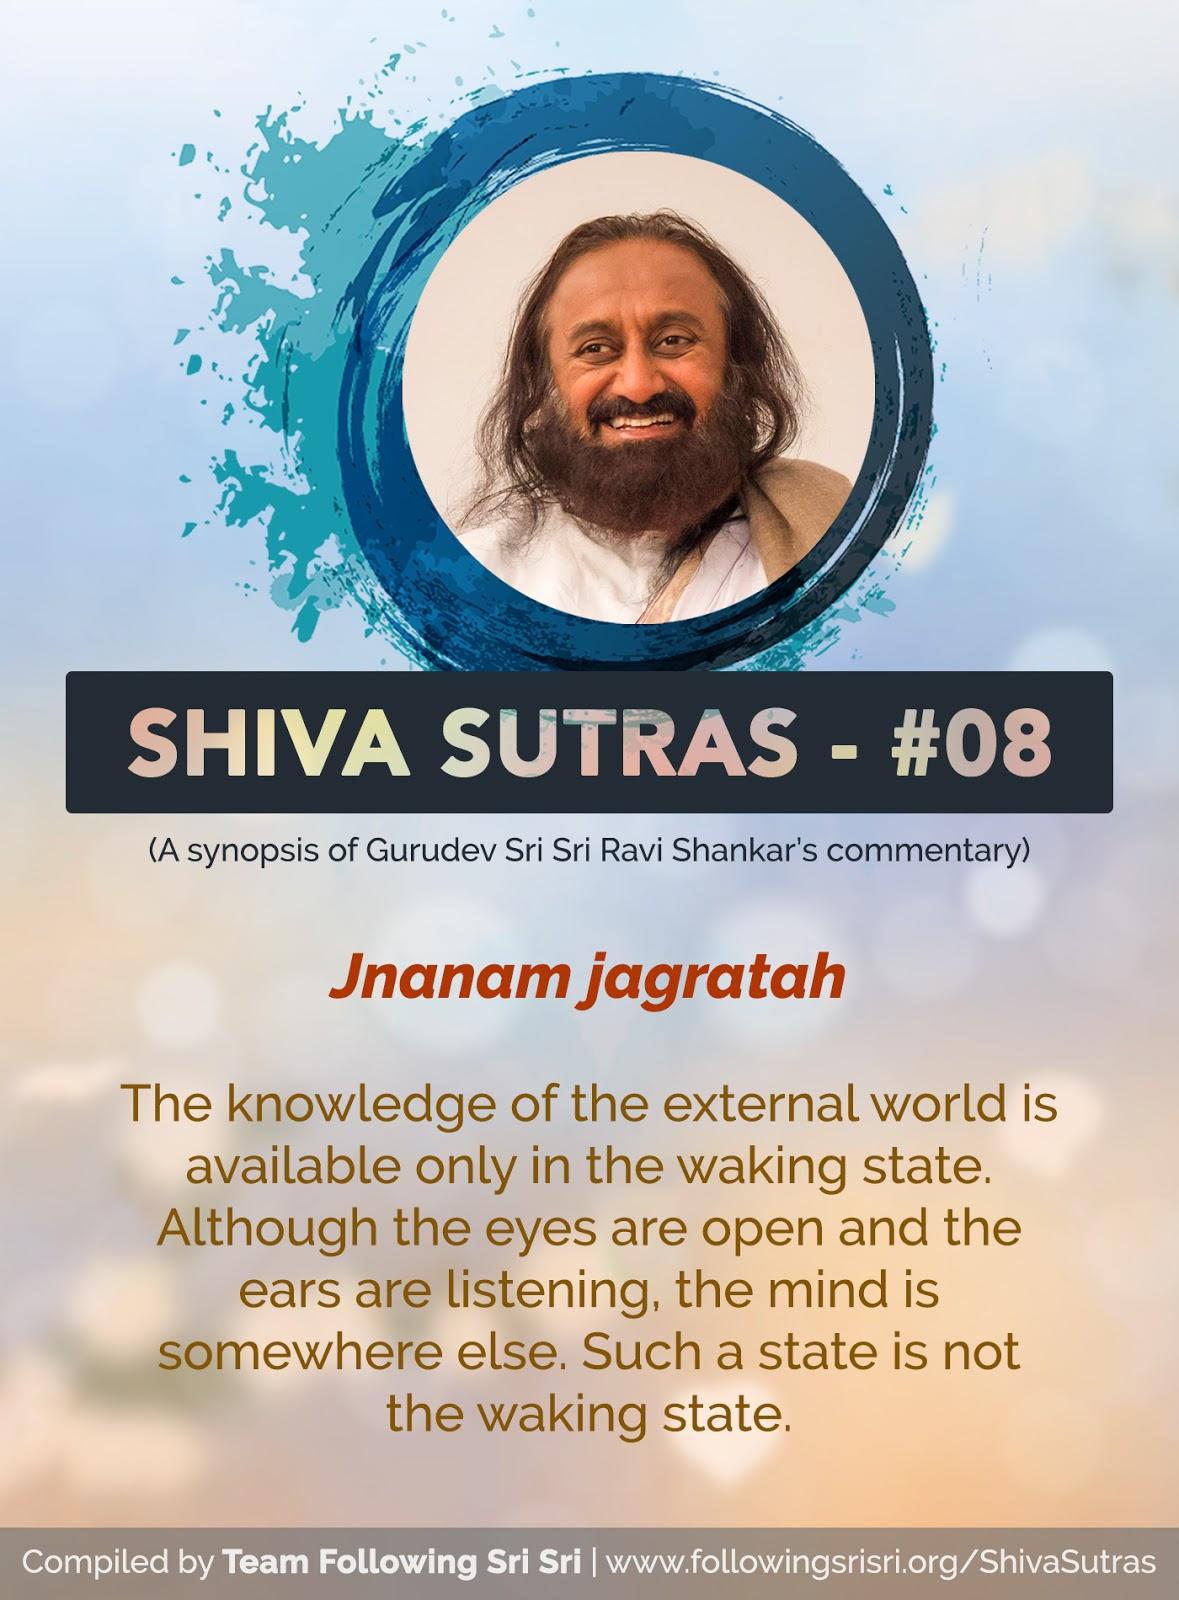 Shiva Sutras - Sutra 8